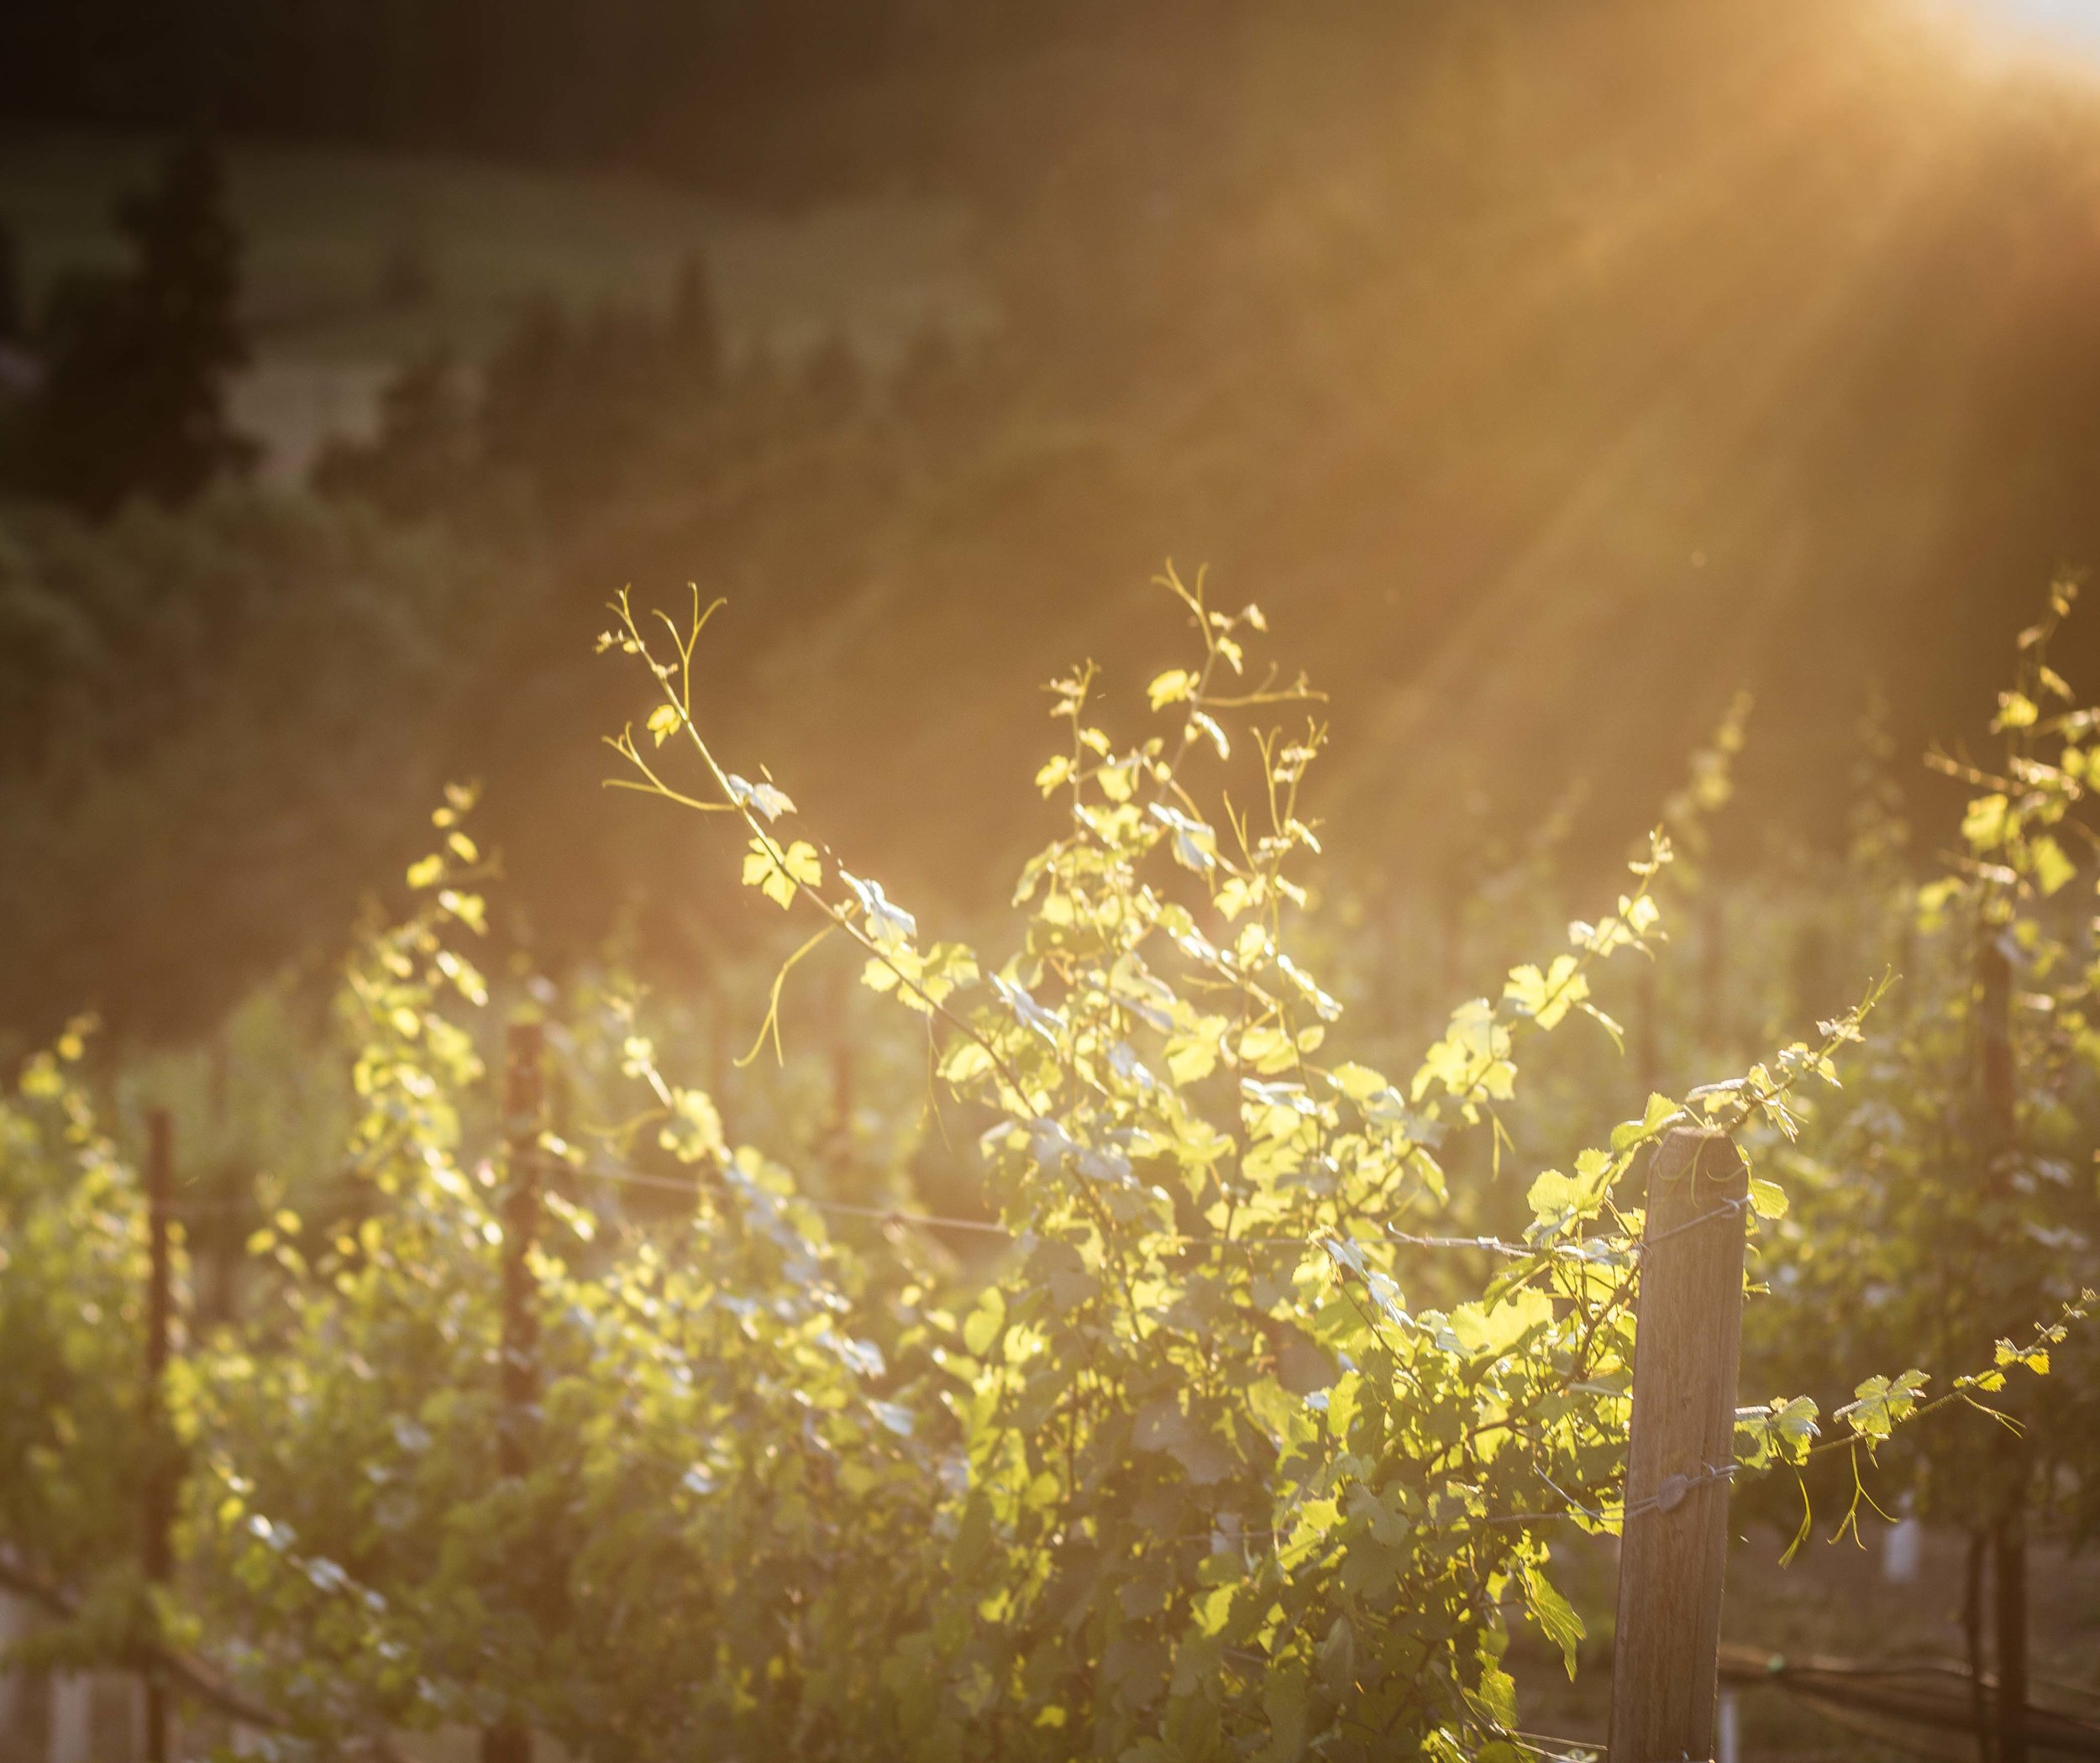 Hood River Wine Alliance Columbia Gorge Wine Mt.Hood Vinyards things to do vacation beautiful scenic fruit loop wine_-20.jpg